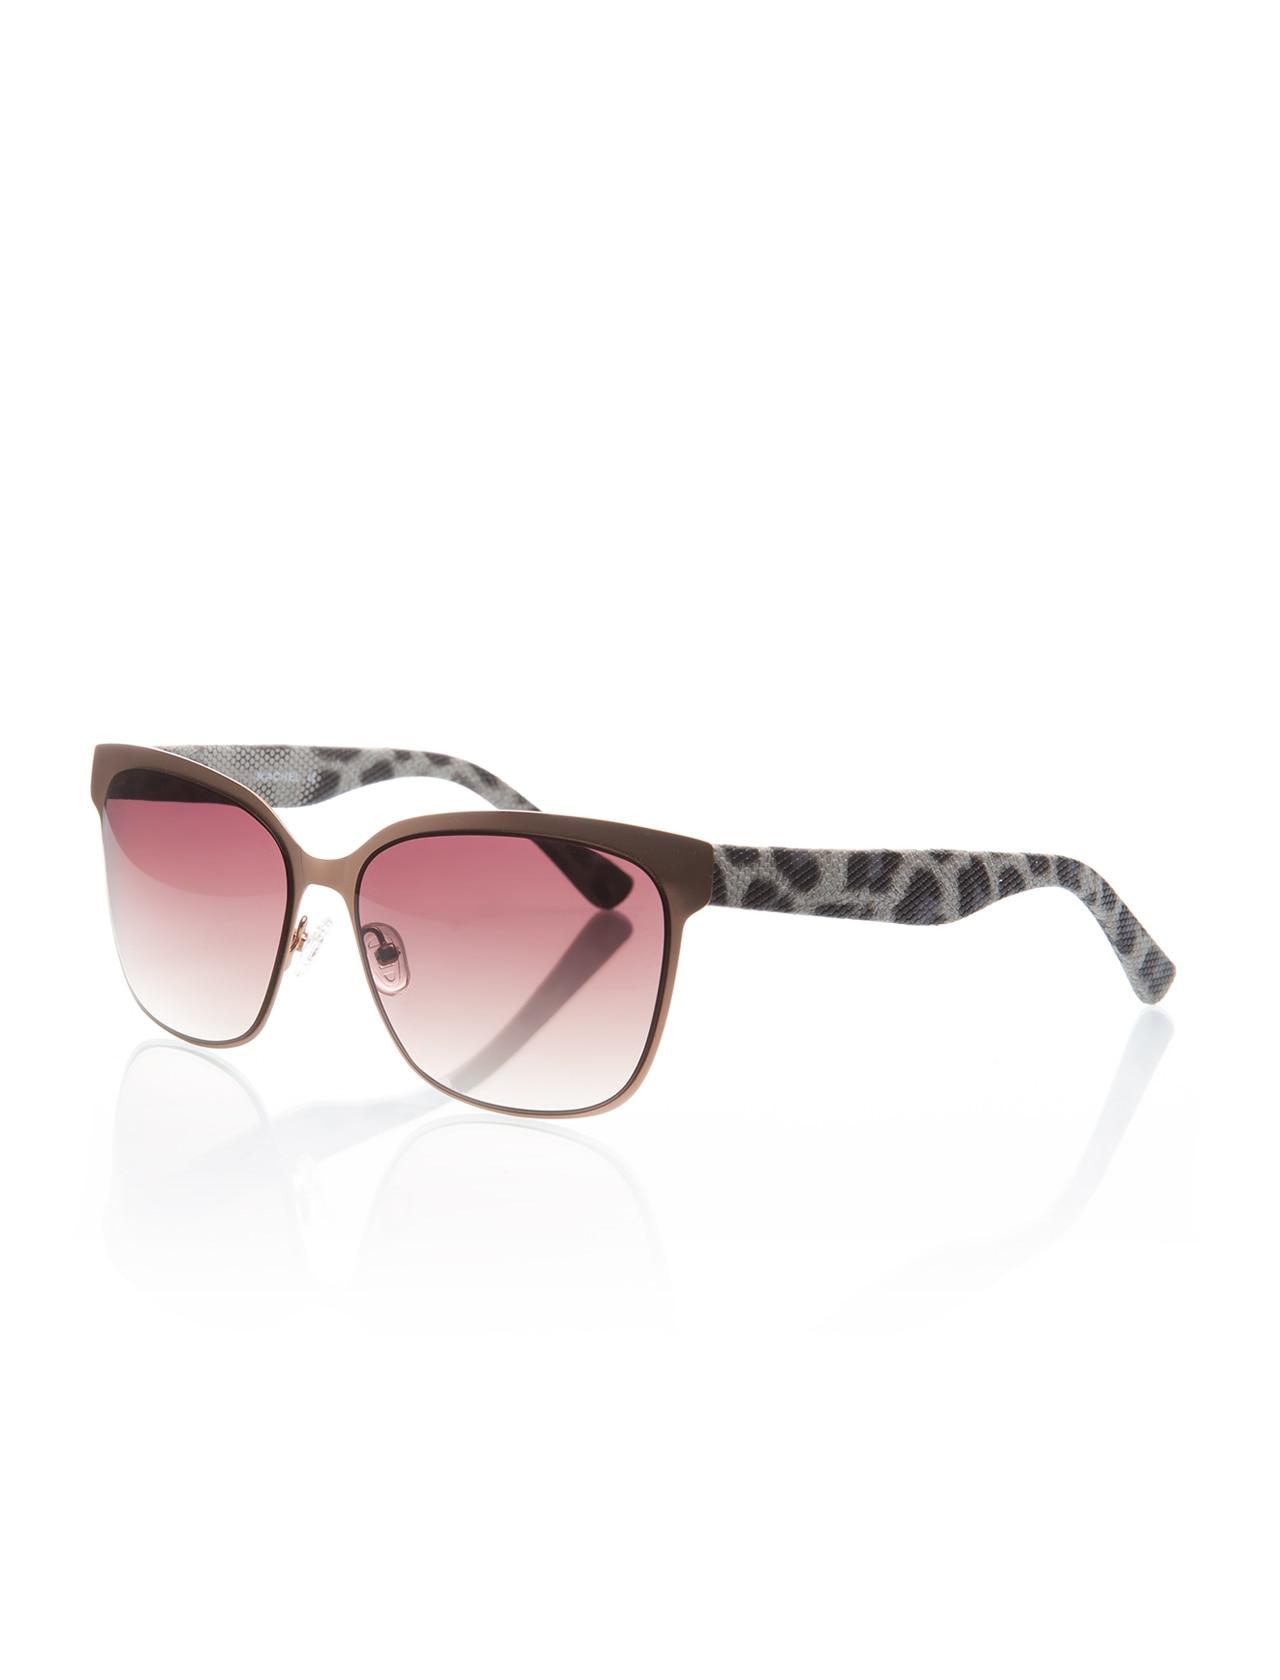 Women's sunglasses rh 514 02 metal copper organic square square 57-16-140 rachel